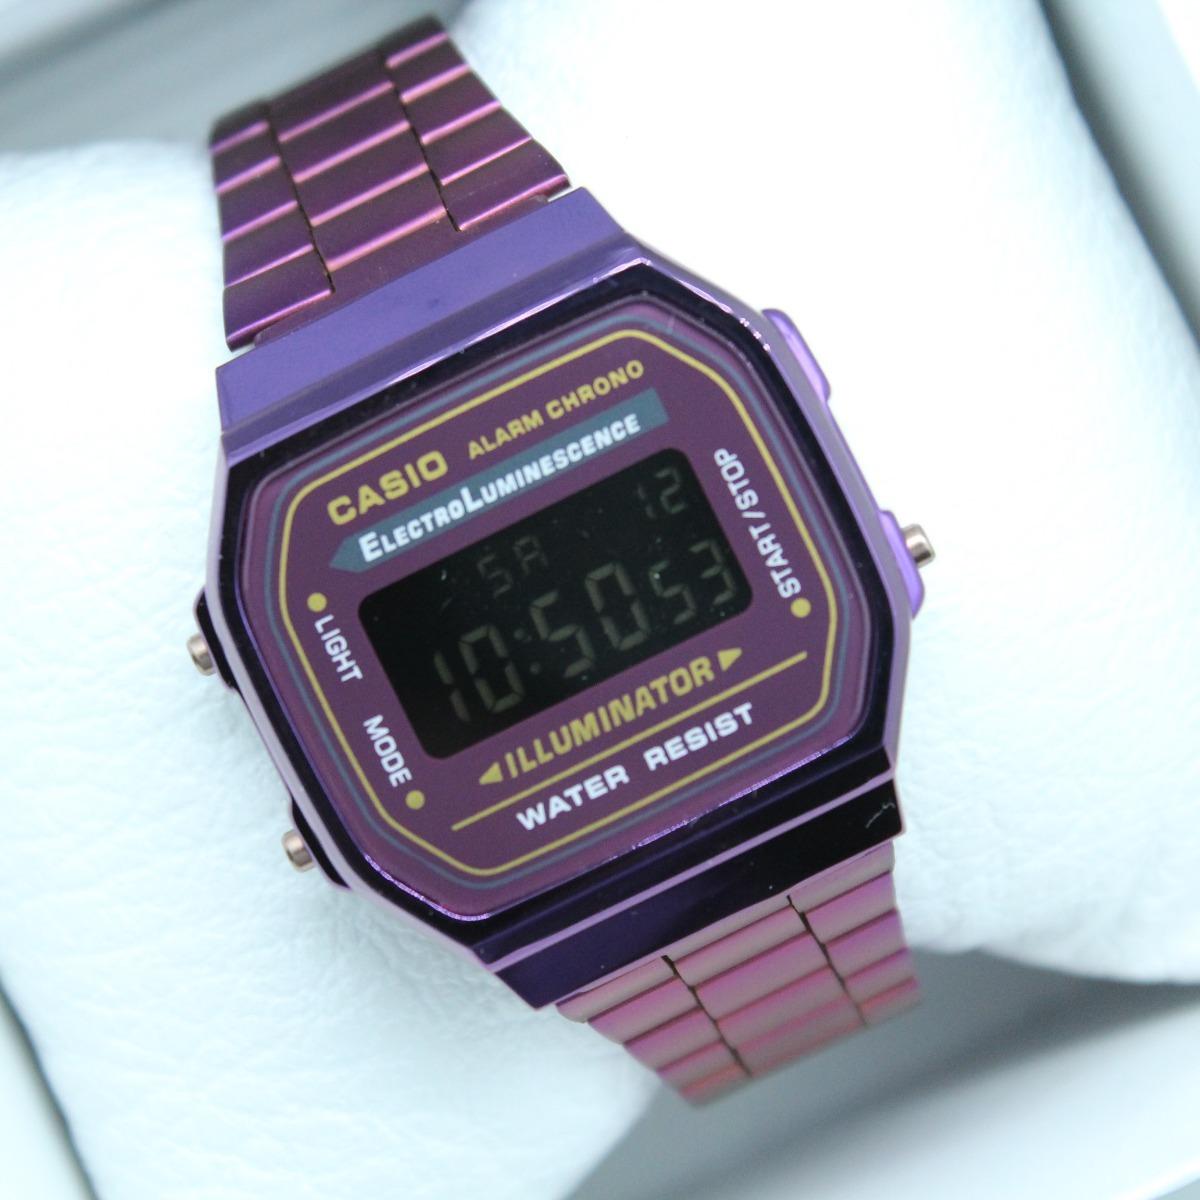 a84e535eff1f Reloj Casio A168 Morado Retro Vintage -   429.00 en Mercado Libre